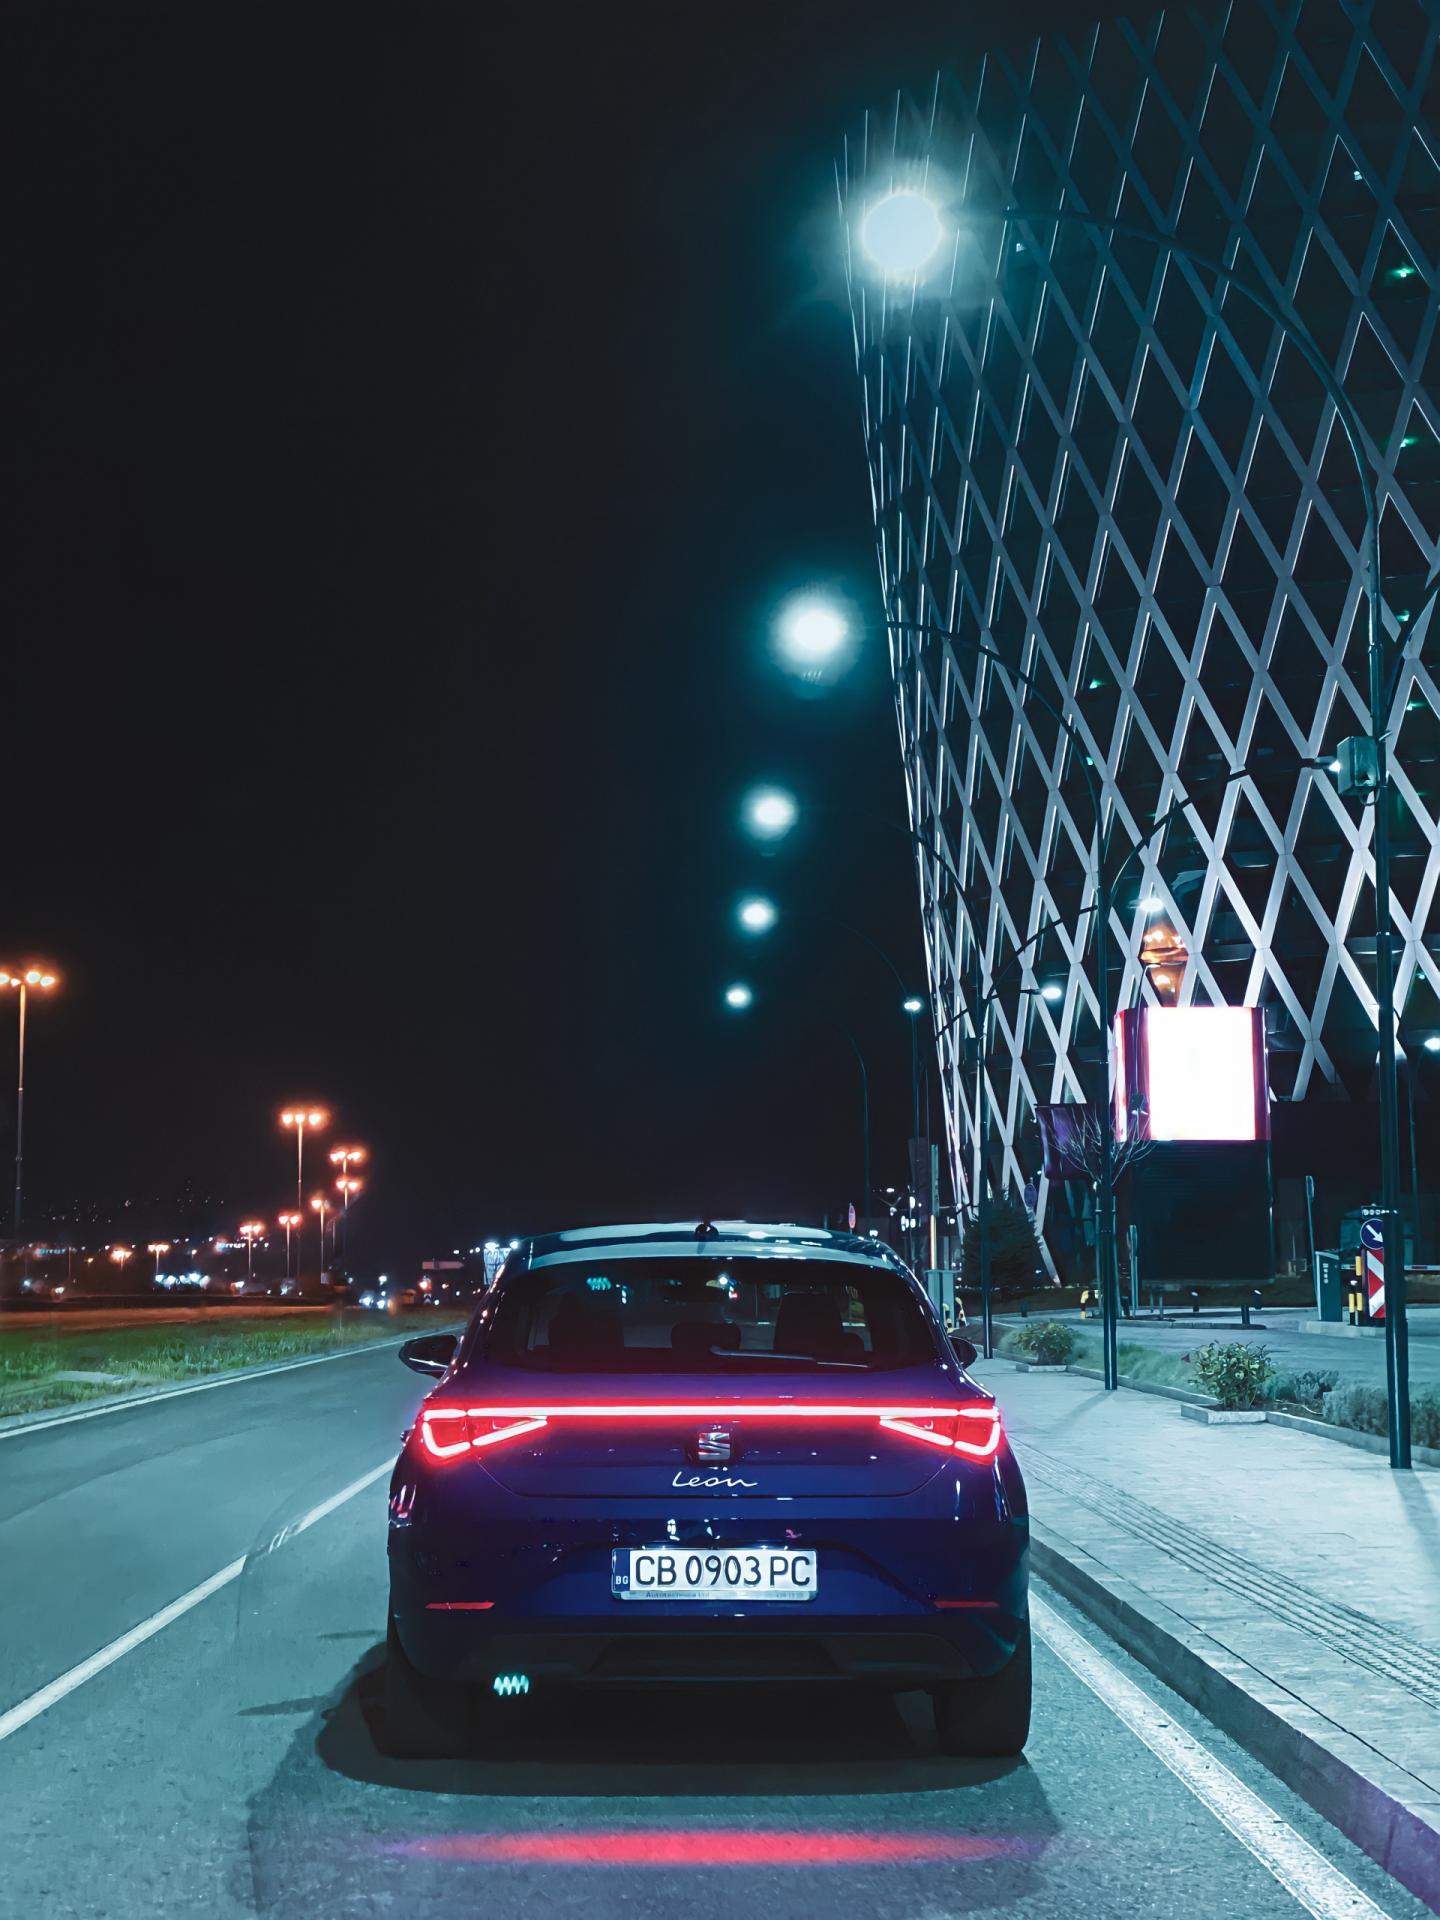 New Seat Leon at night